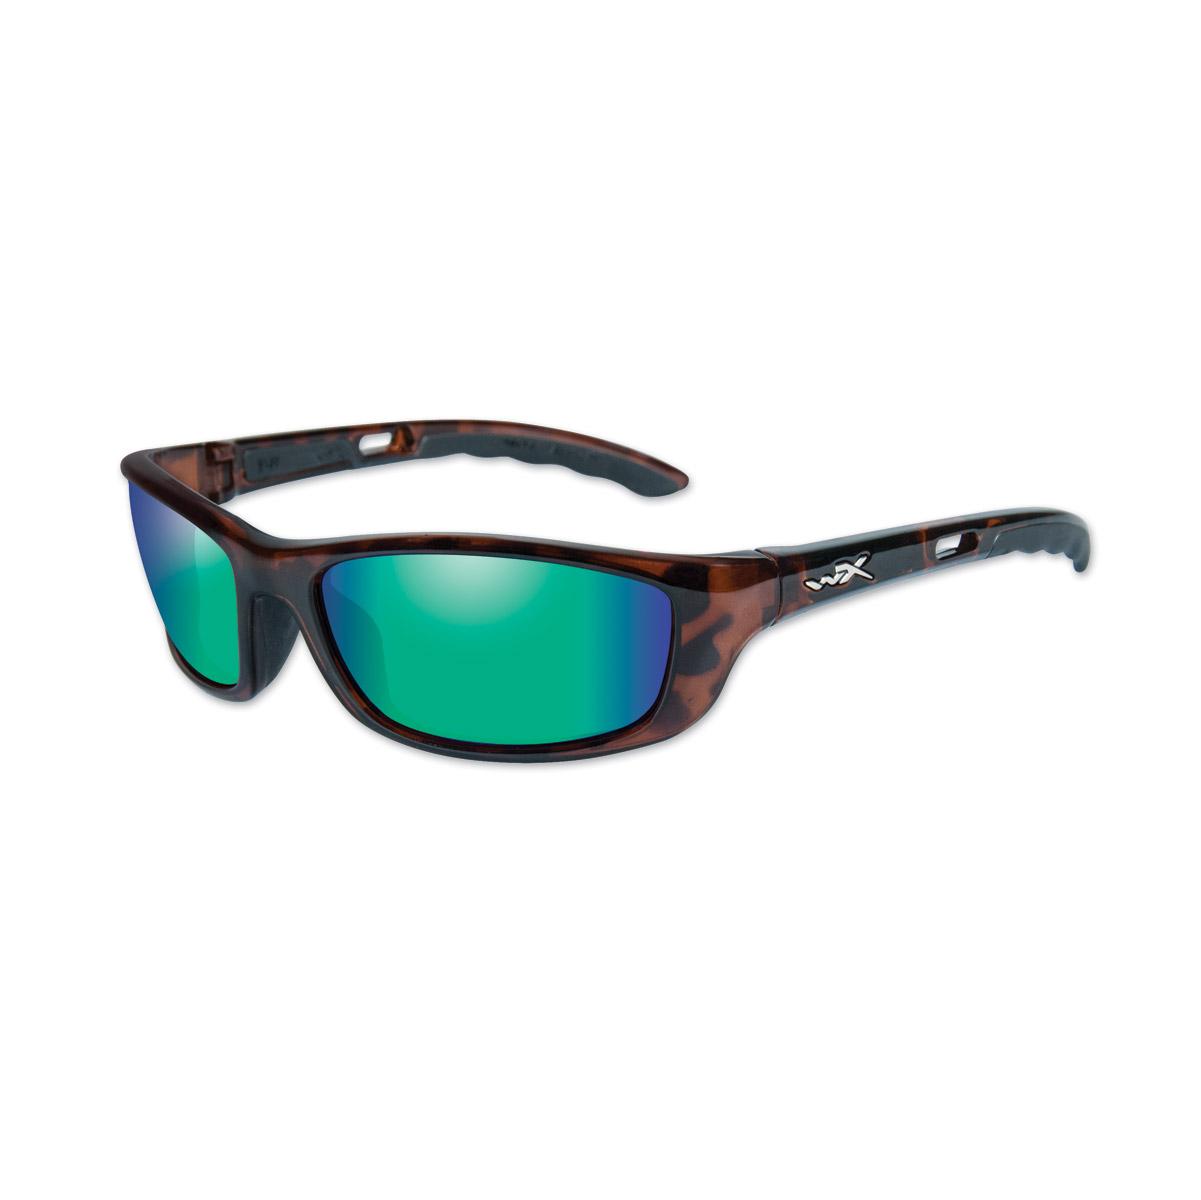 Wiley X P-17 Gloss Demi Frame w/Emerald Lens Sunglasses